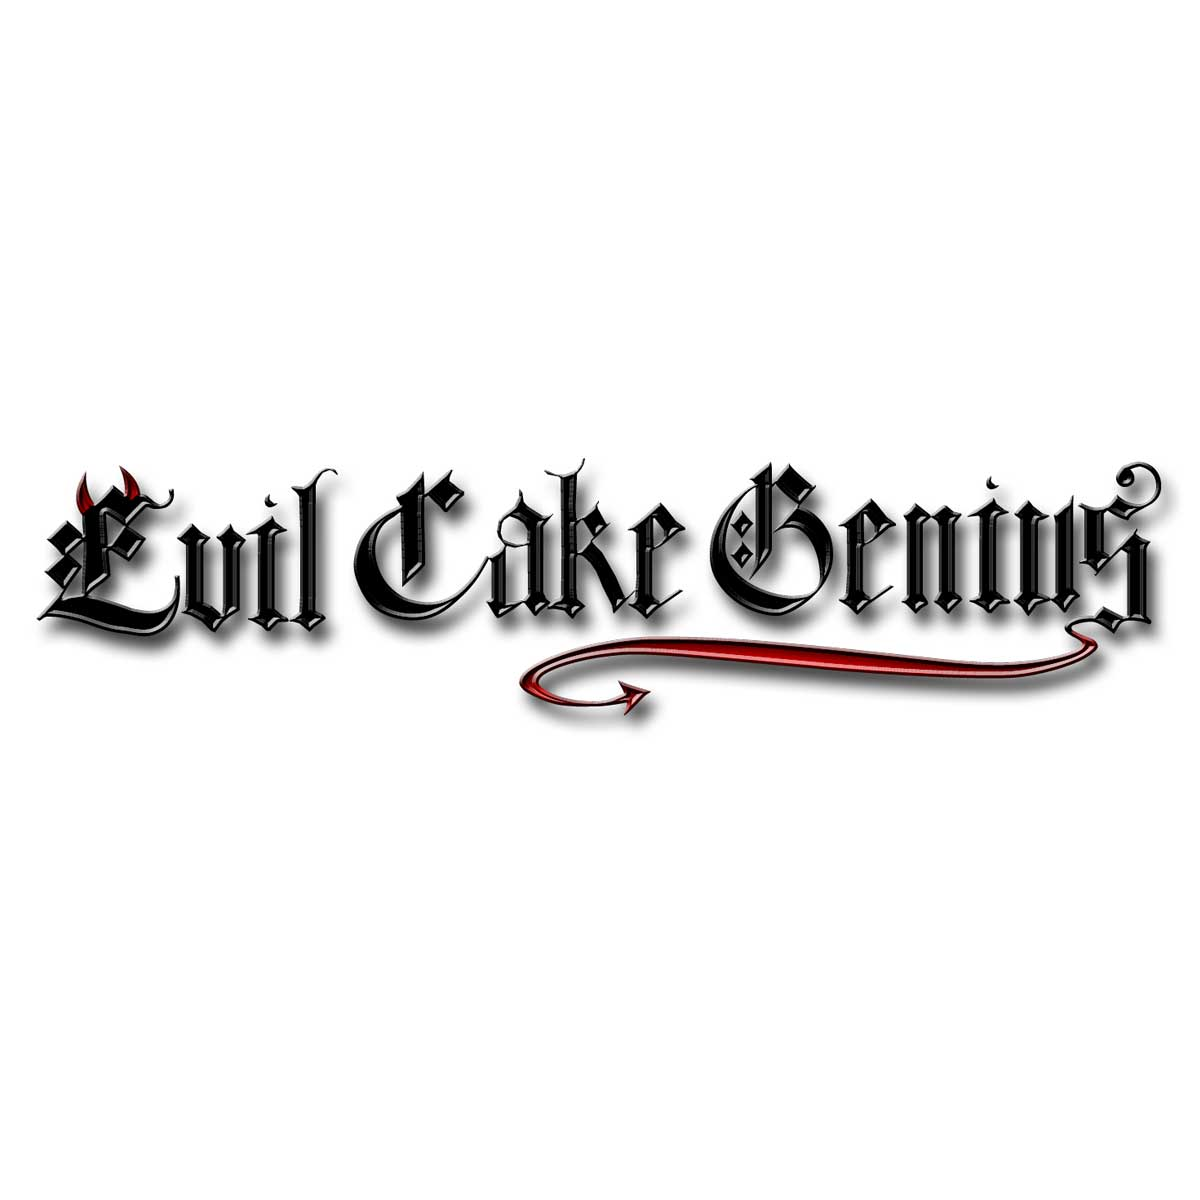 Cake Dutchess Modelling Tools